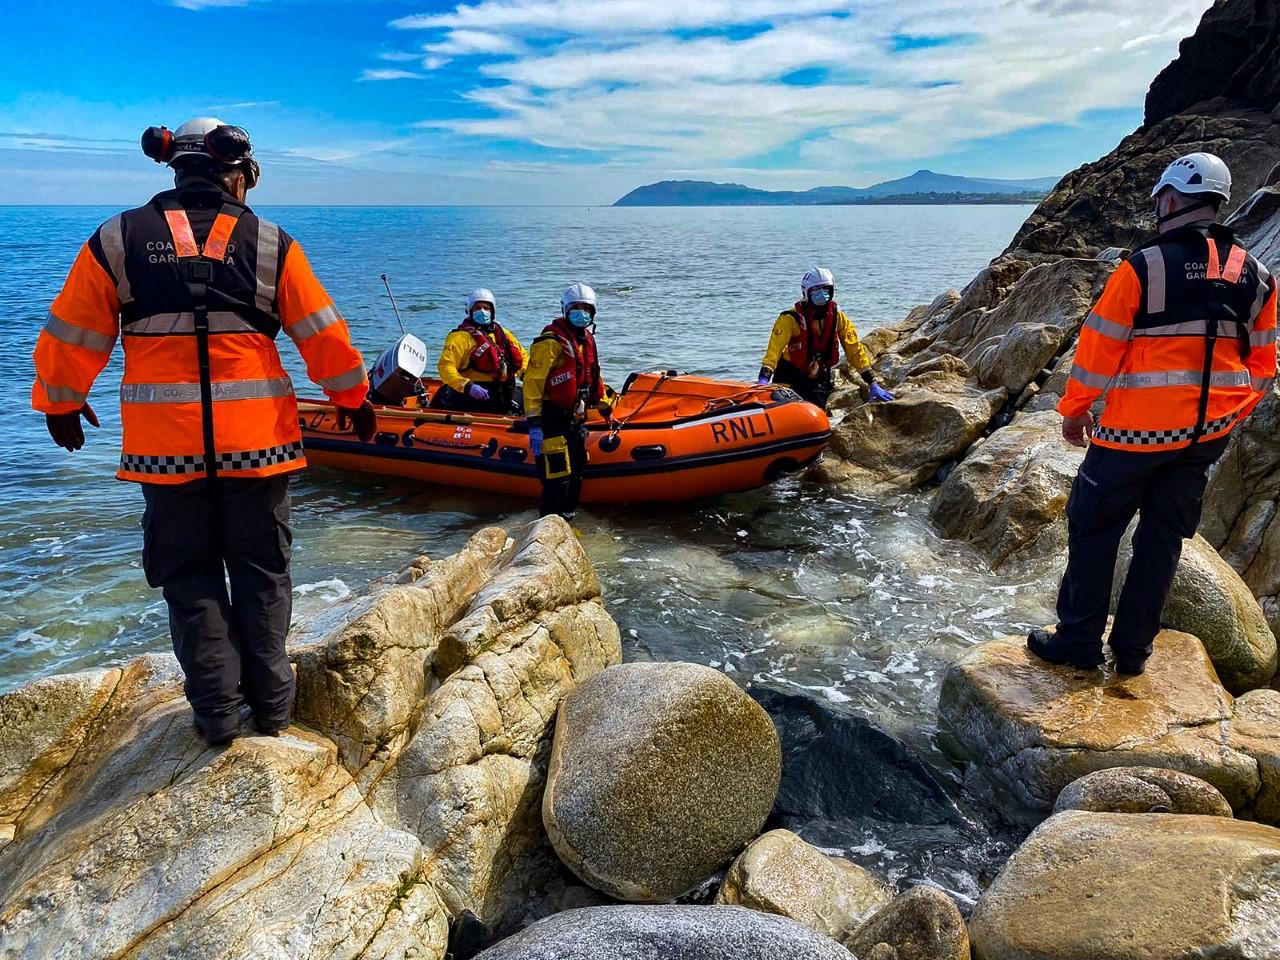 Dun Laoghaire RNLI Irish Coast Guard Dun Laoghaire